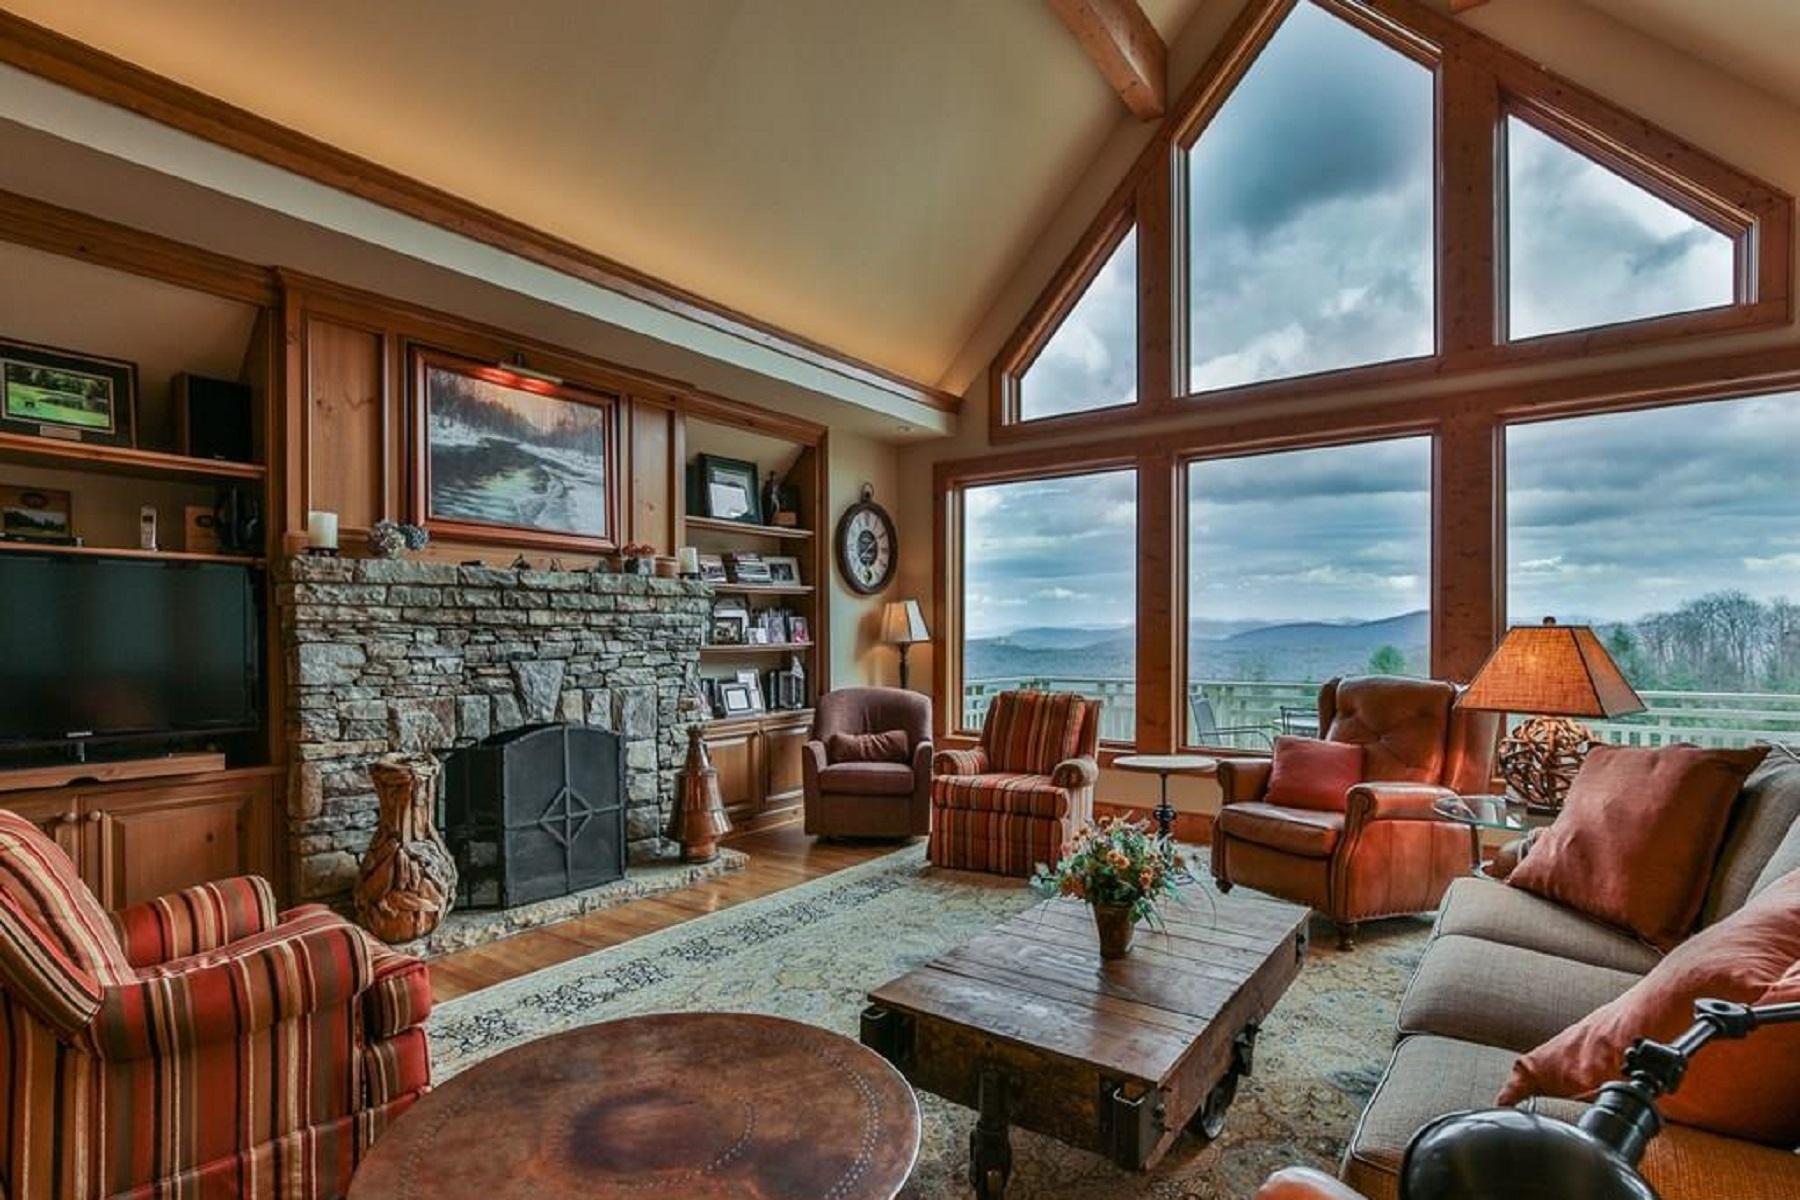 Single Family Homes for Sale at 622 Whiteside Mountain Road Highlands, North Carolina 28741 United States